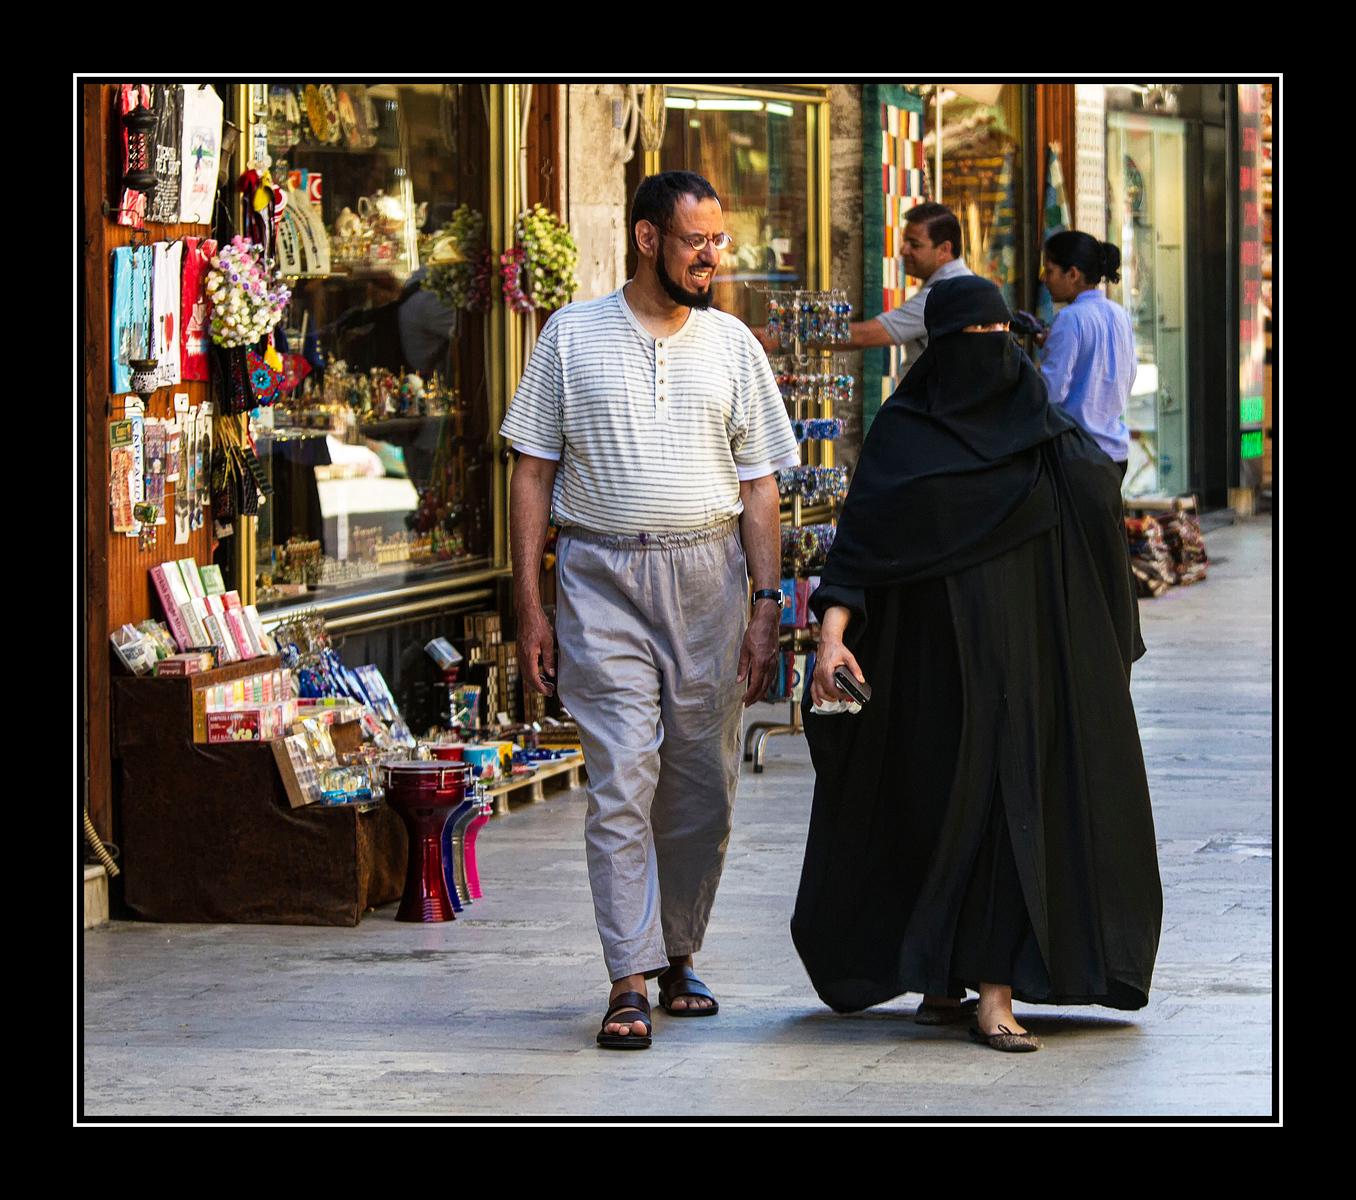 IMAGE: https://photos.smugmug.com/Travel/Istanbul/i-T3PH4zZ/0/311d2621/X3/Man%20and%20woman%20in%20veil-X3.jpg